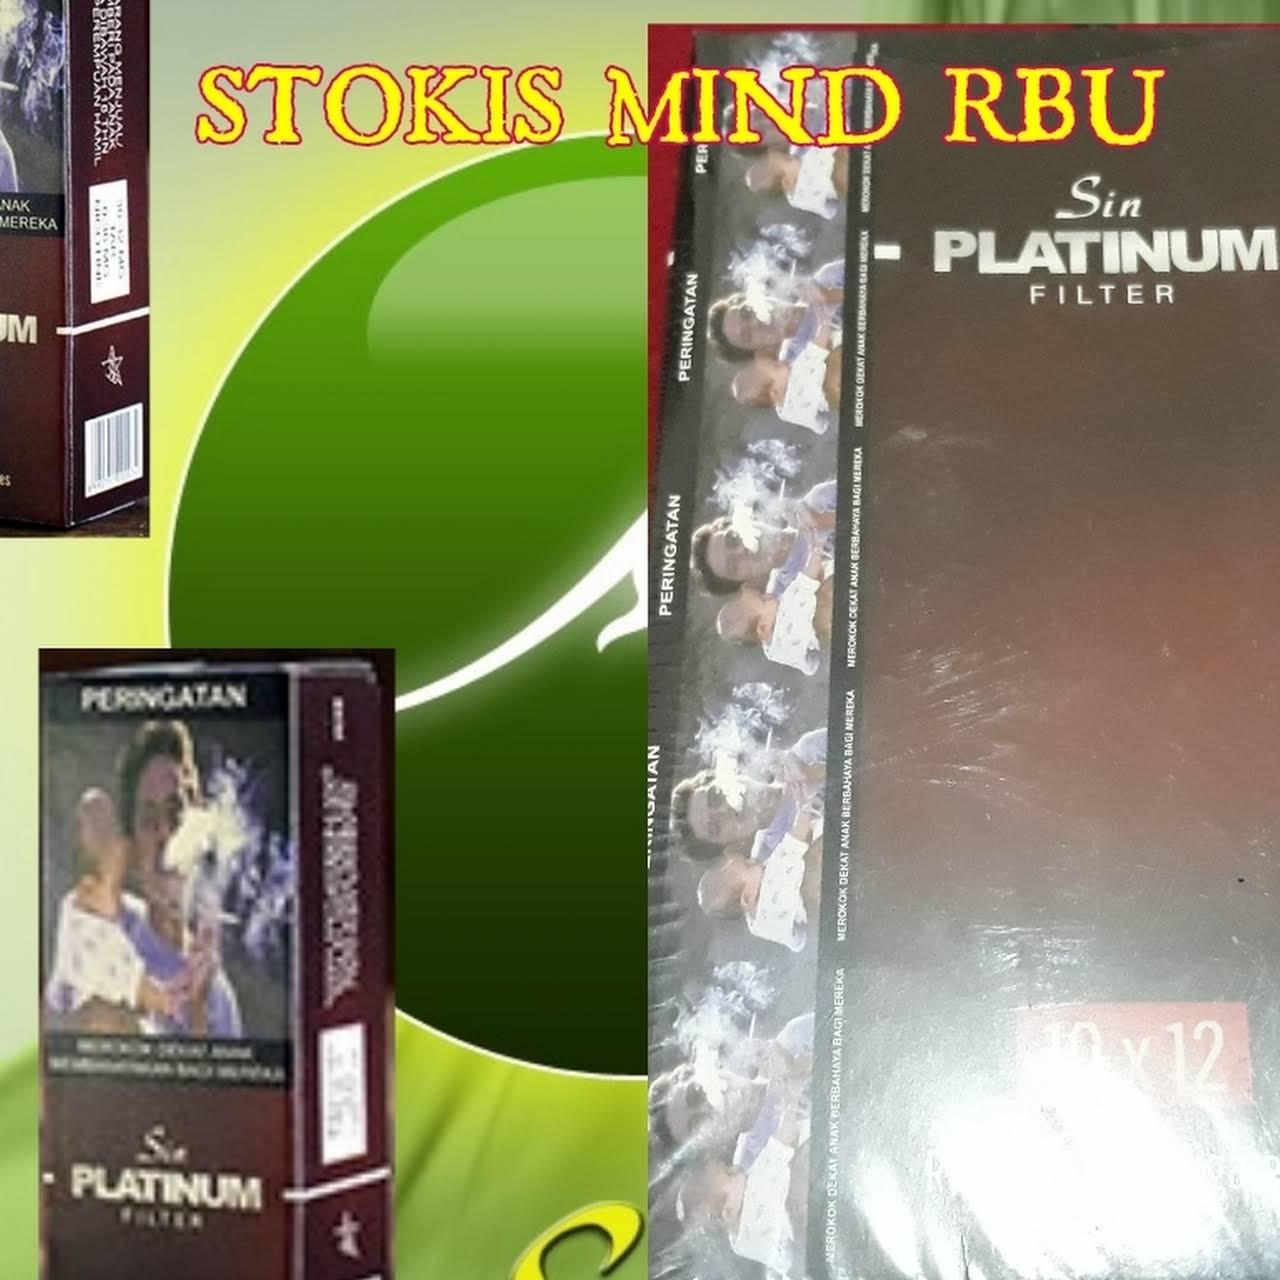 Agen Stokis Mind Rbu Rokok Sin Herbal Pemasaran Platinum Filter Isi 1 S